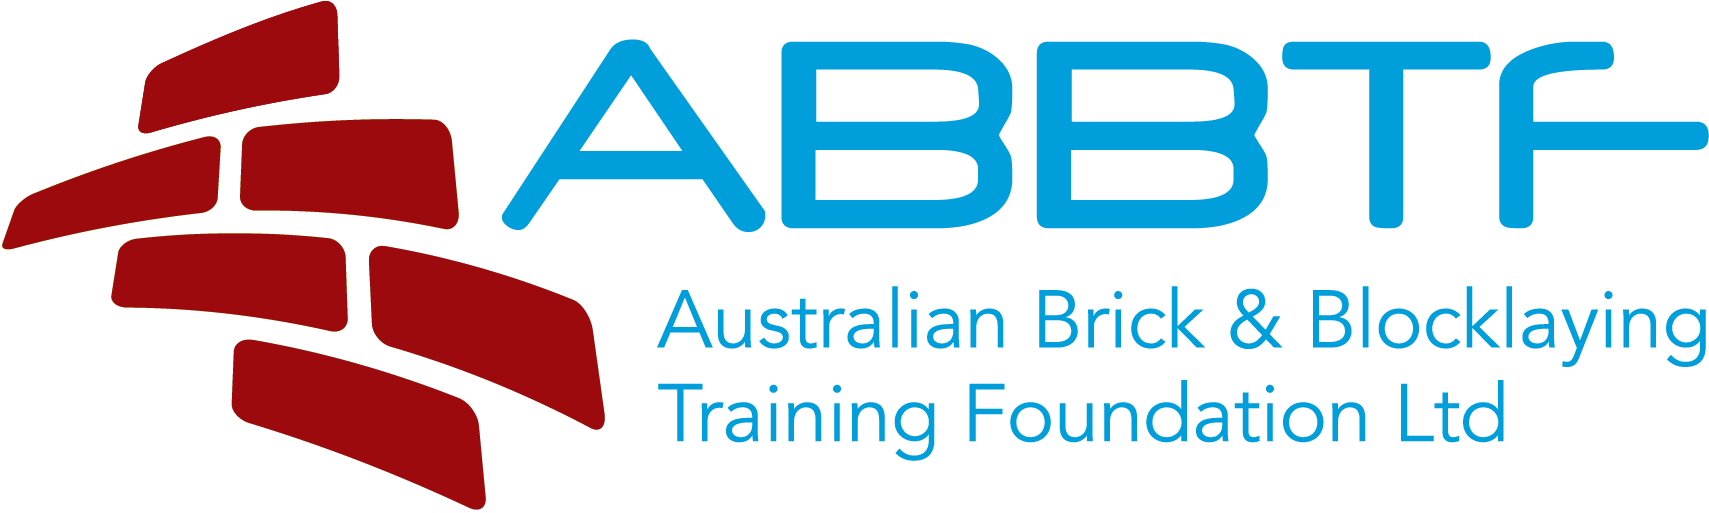 abbtf-logo-new